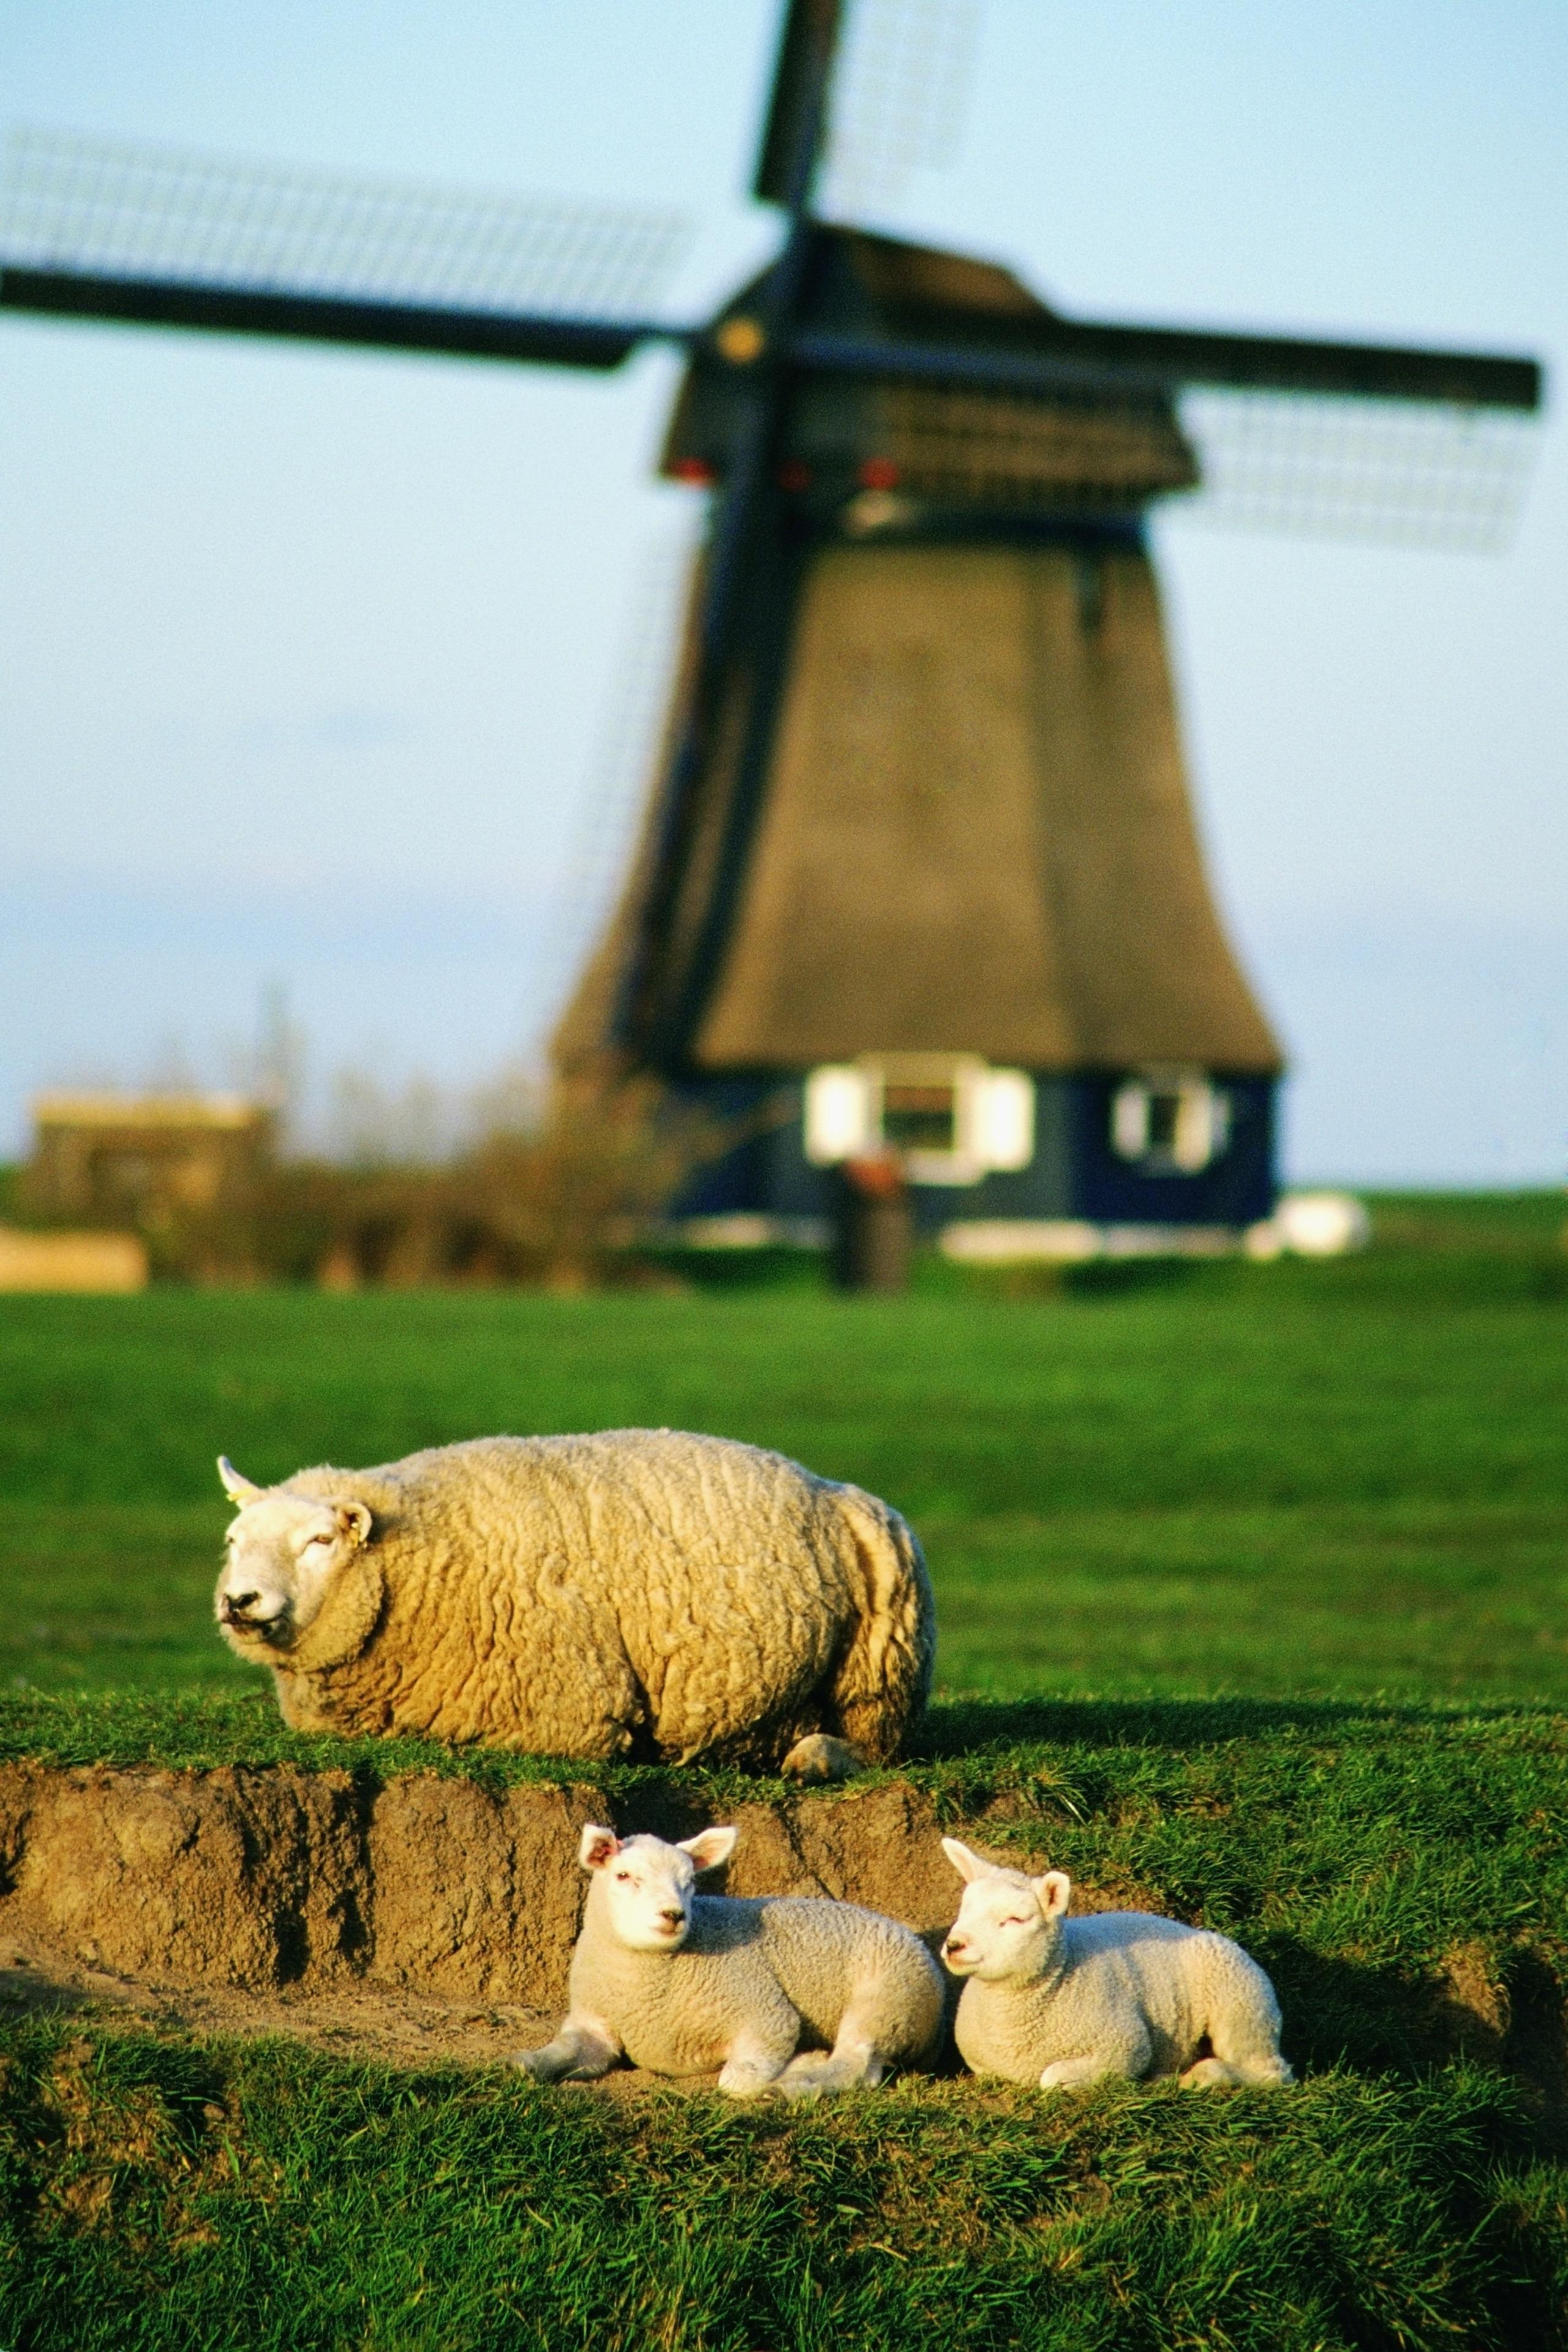 Petten, Nordholland, Niederlande